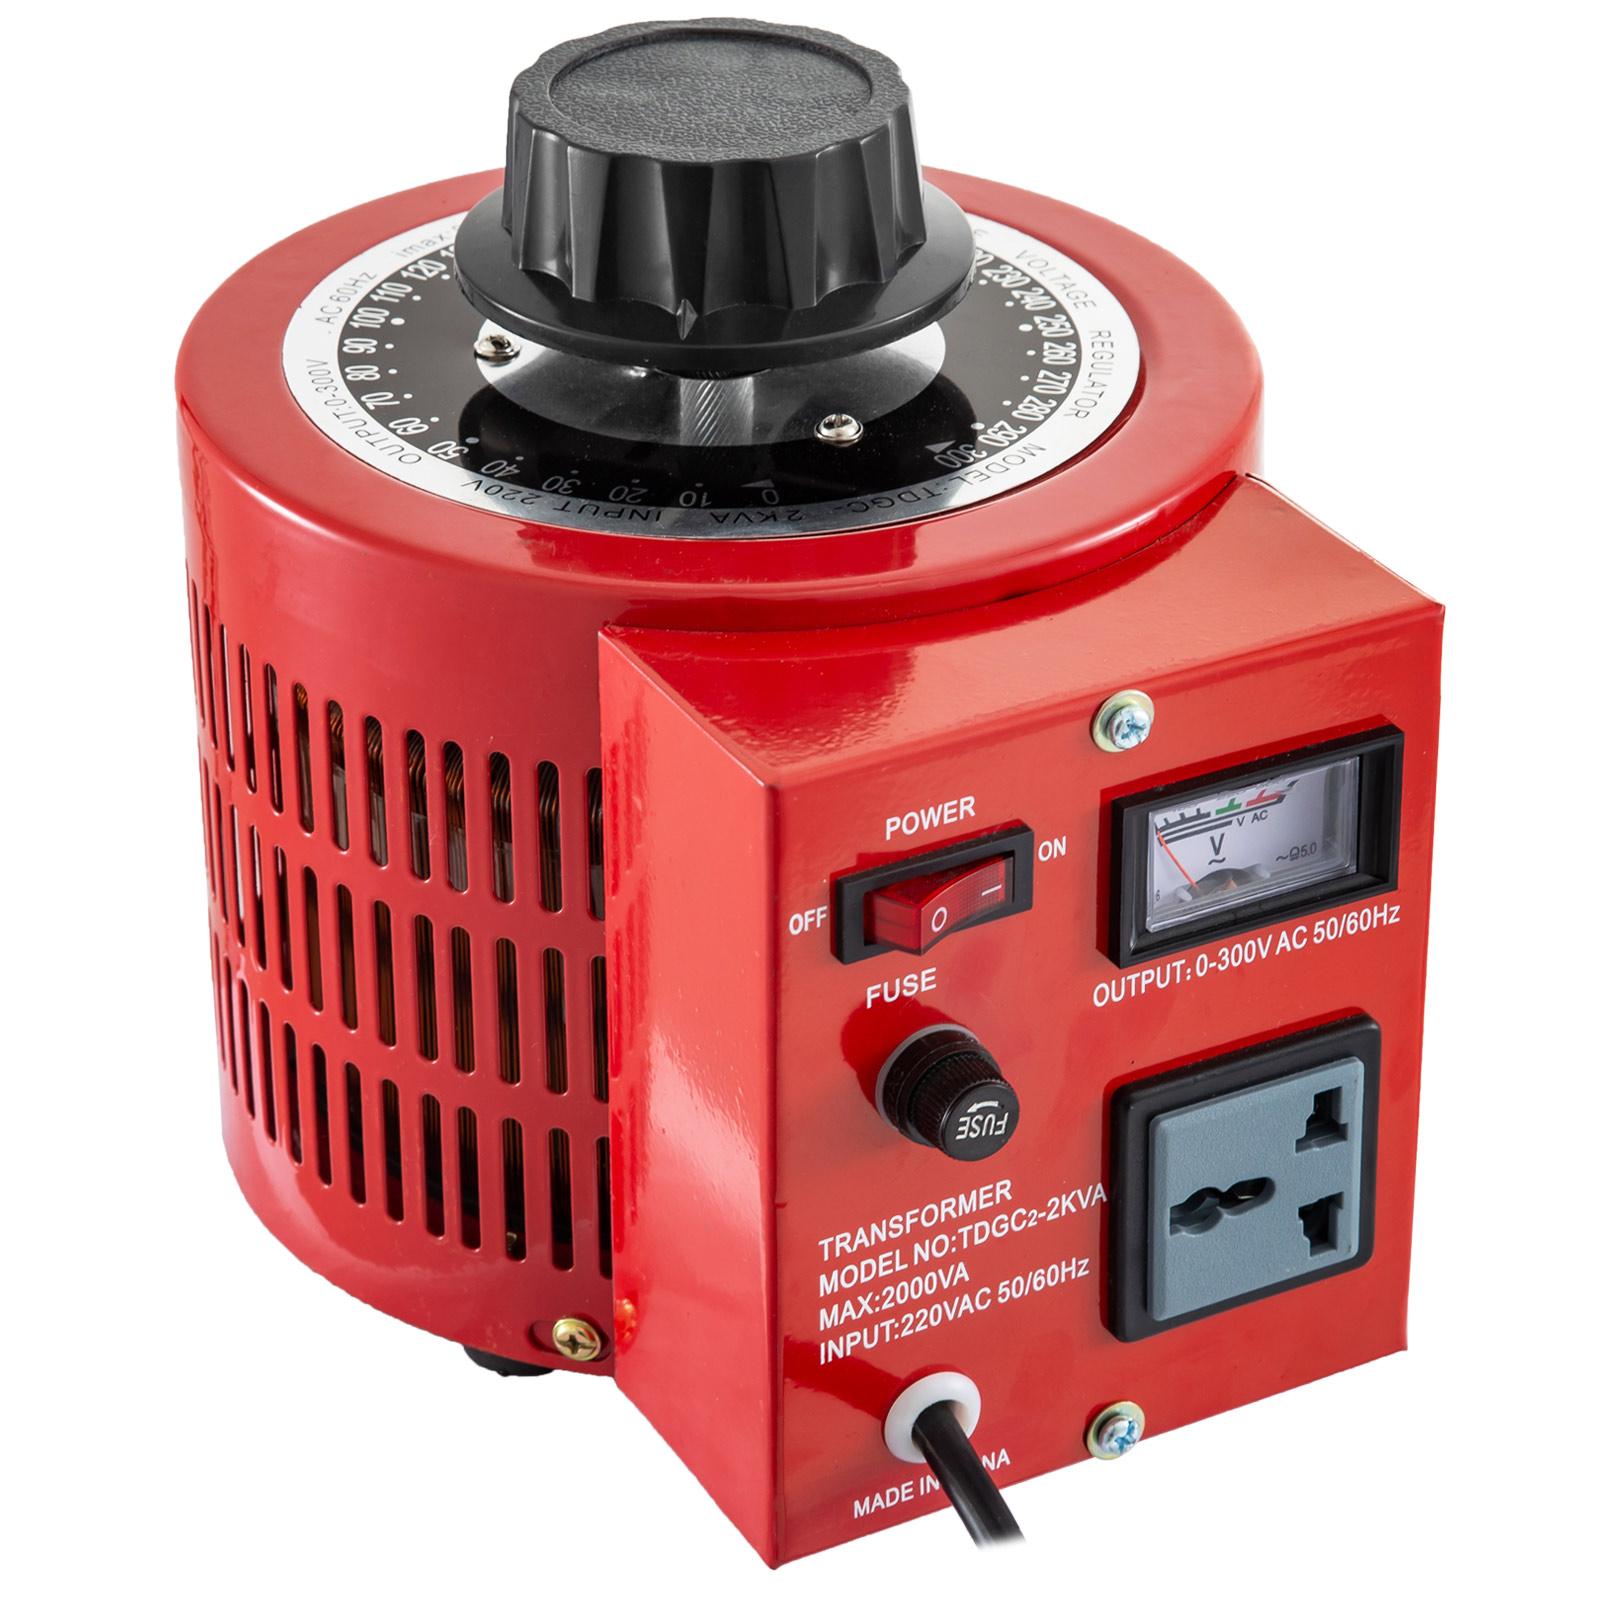 Auto-Variac-Variable-Transformer-0-5-1-2-3KVA-Regulator-pure-copper-coil-220V thumbnail 48